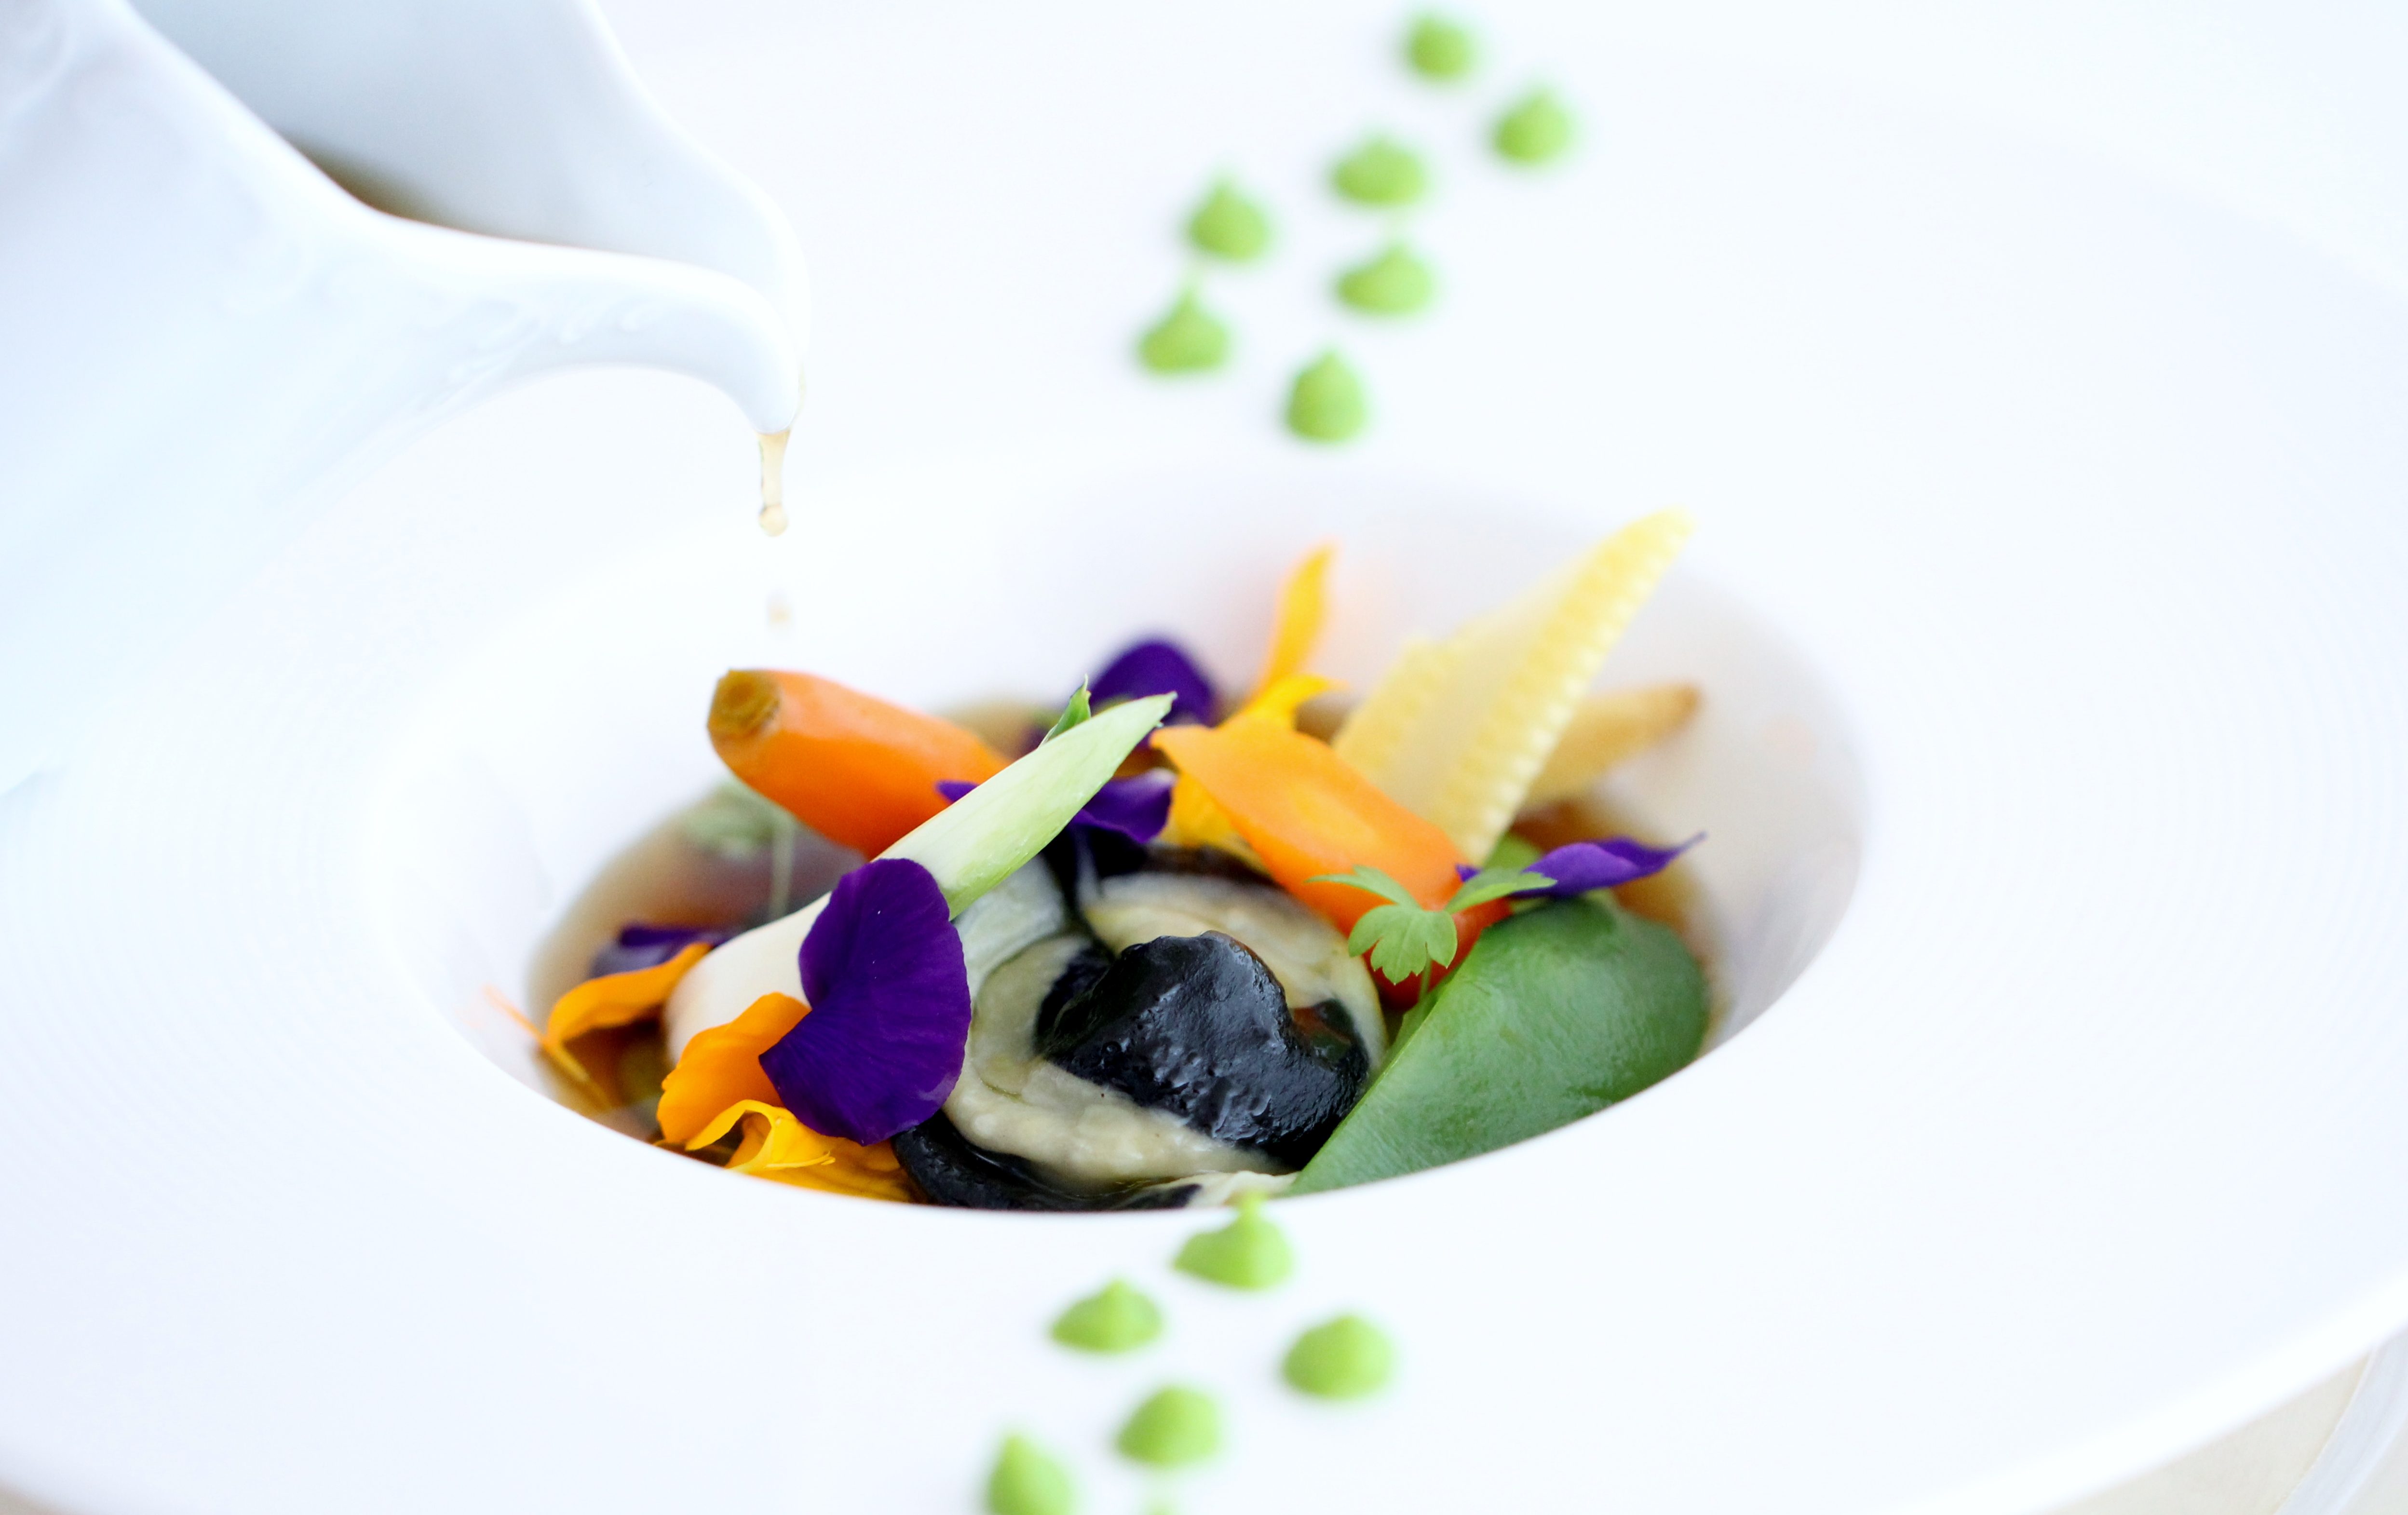 Bellevue Rheinhotel_Boppard_Gourmetrestaurant_